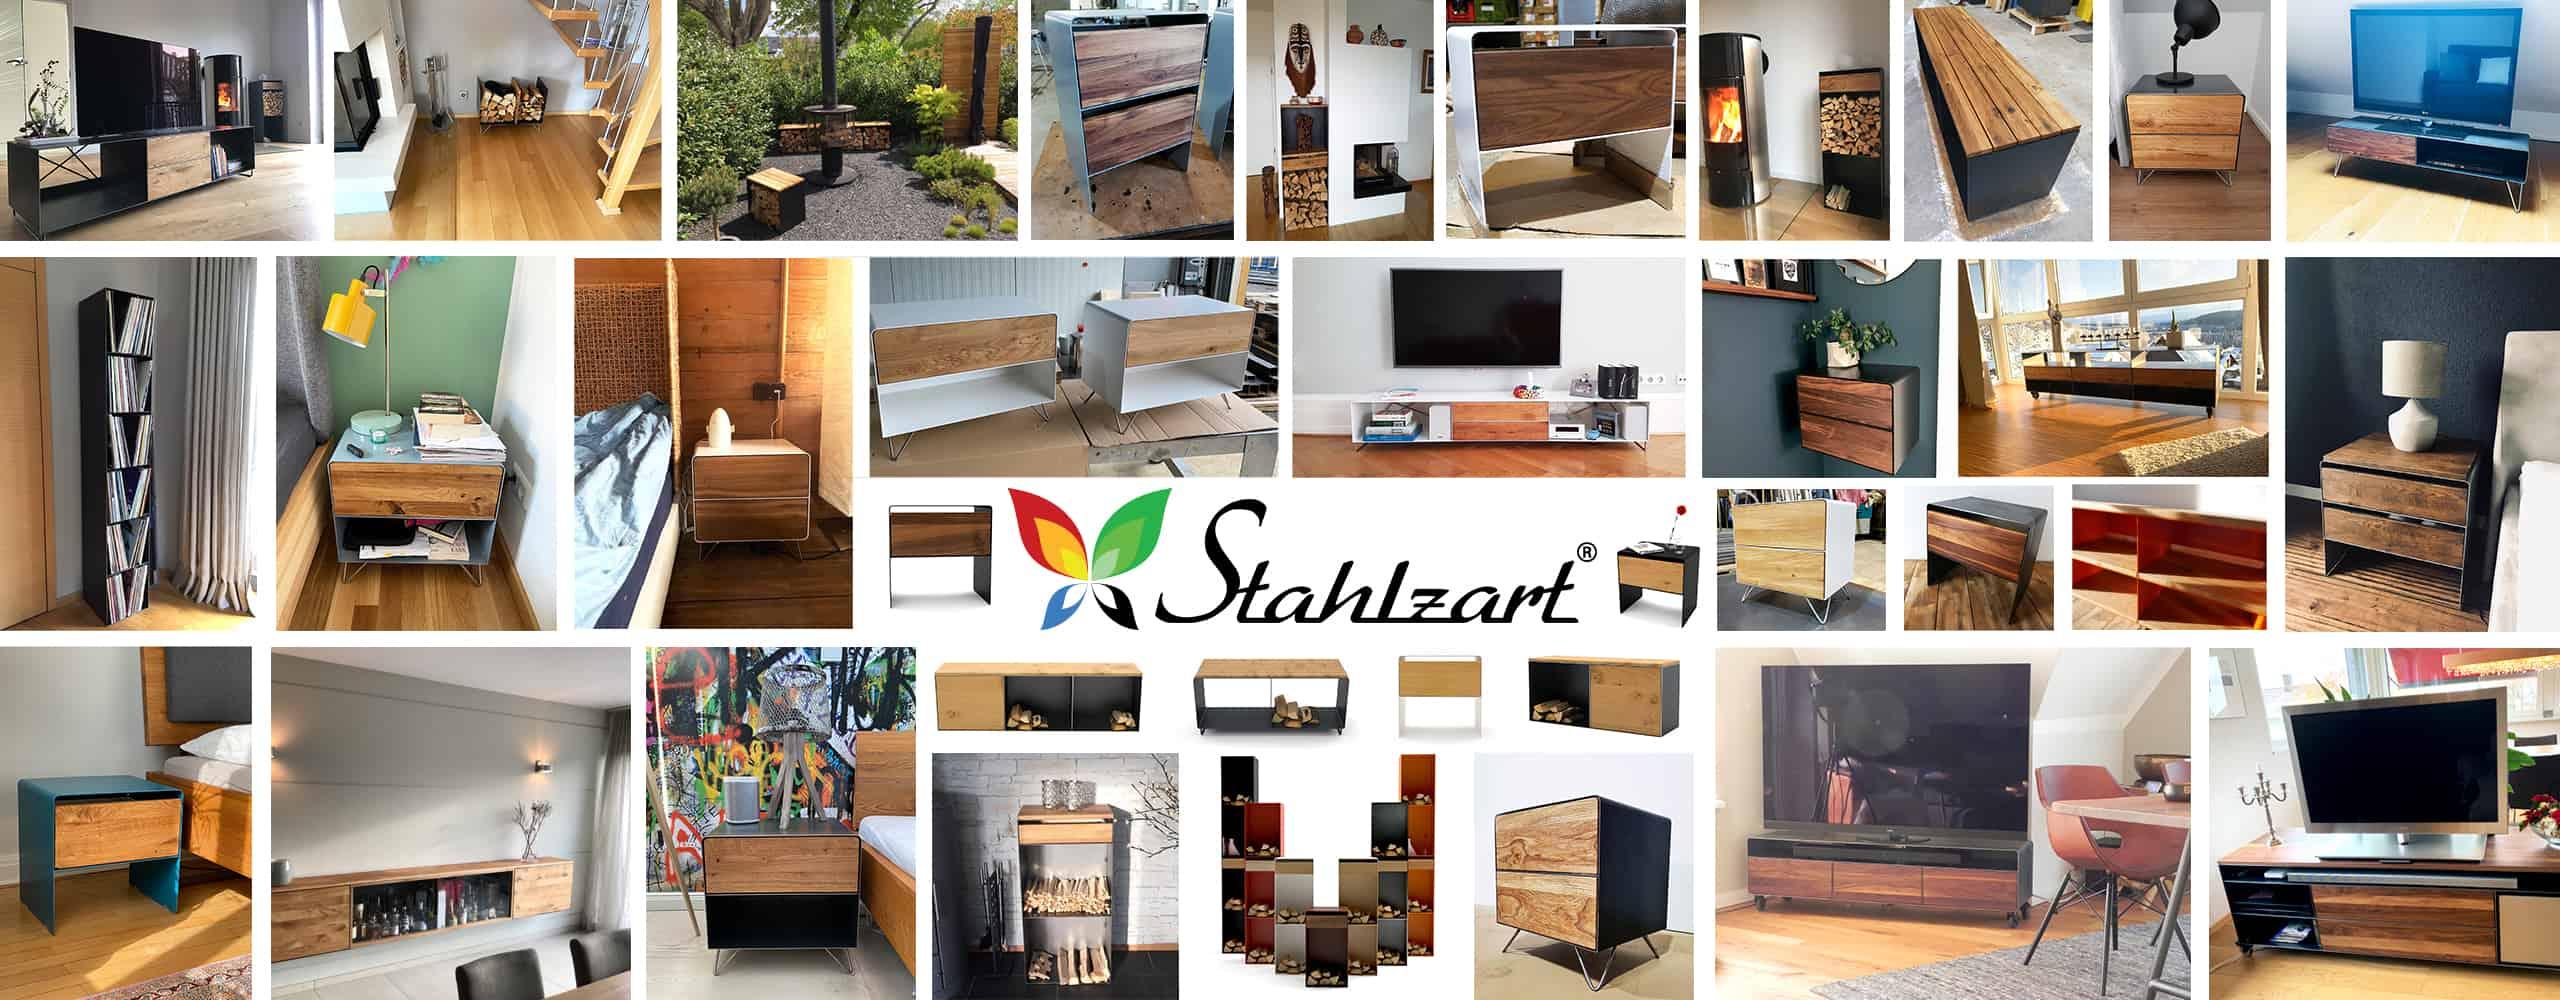 stahlzart-moebel-sideboard-nachttisch-regal-gartenmoebel-tv-lowboard-hocker-sitzbank-kaminholzregal-tisch-weiss-schwarz-grau-holz-eiche-metall-modern-design